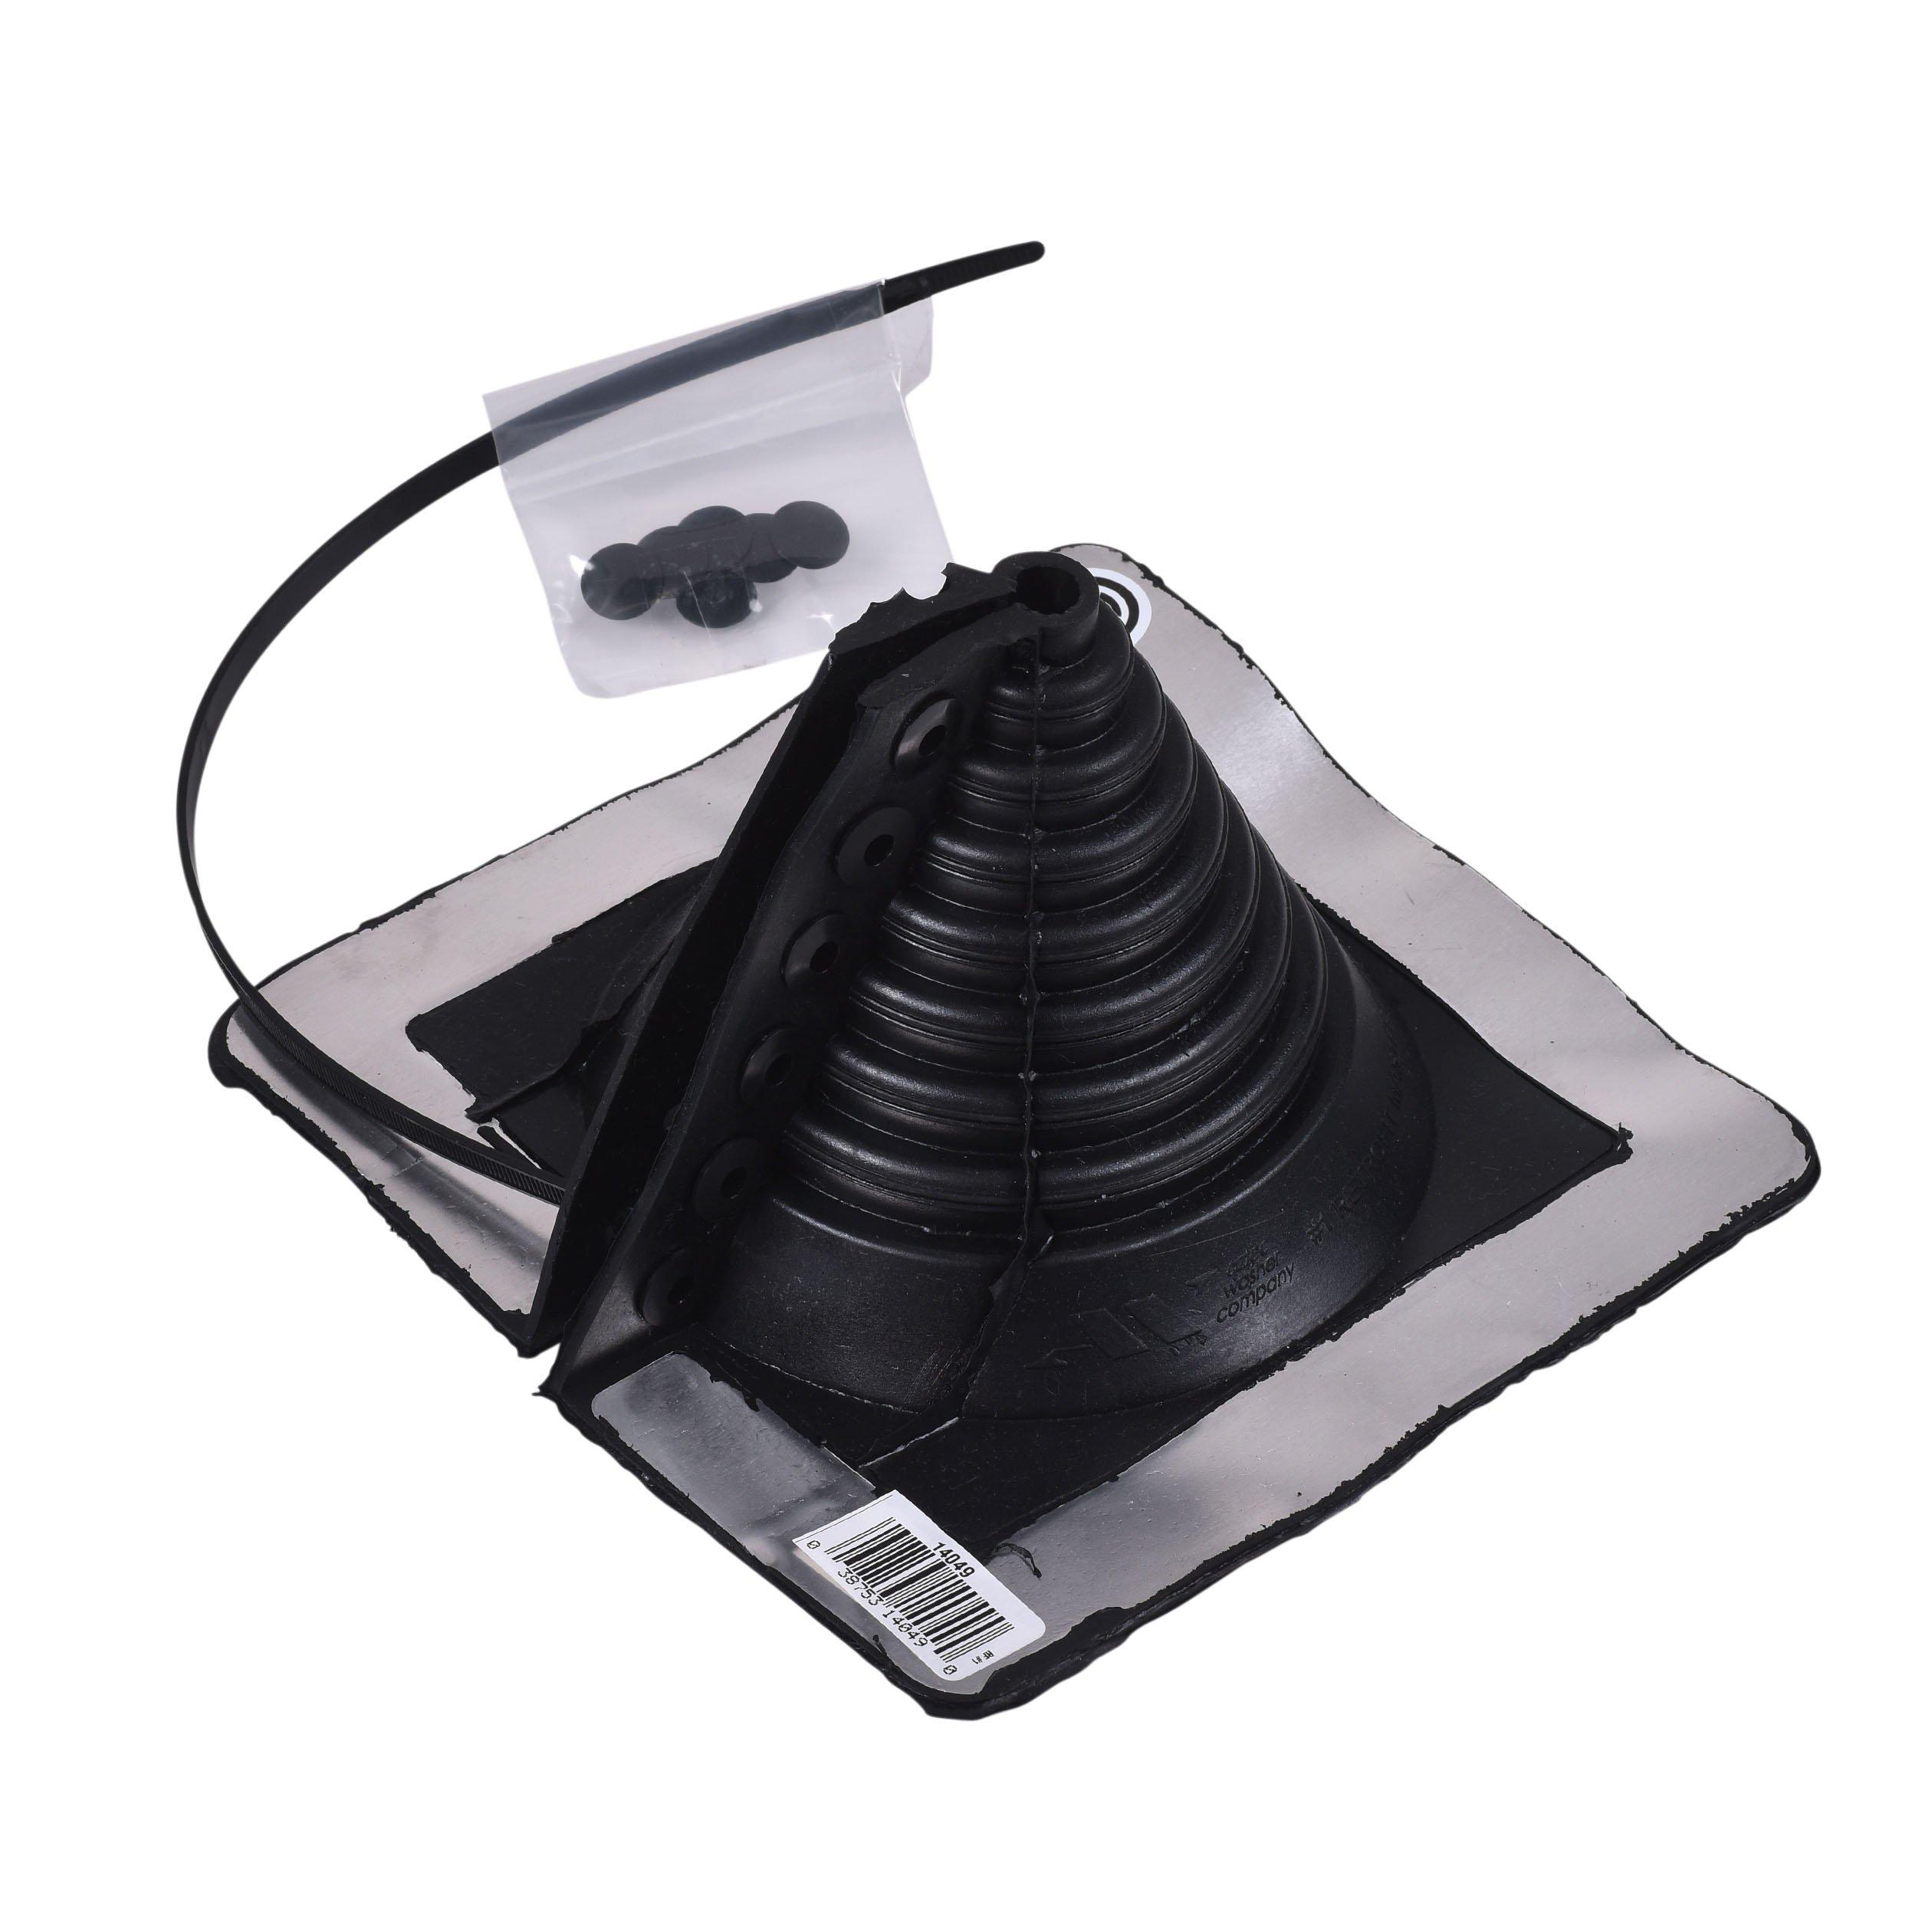 Oatey 14049 Retro Master Flash 0.25'' - 5.75'' pipe diameter Roof Flashing 8'' x 8'' Base by Oatey